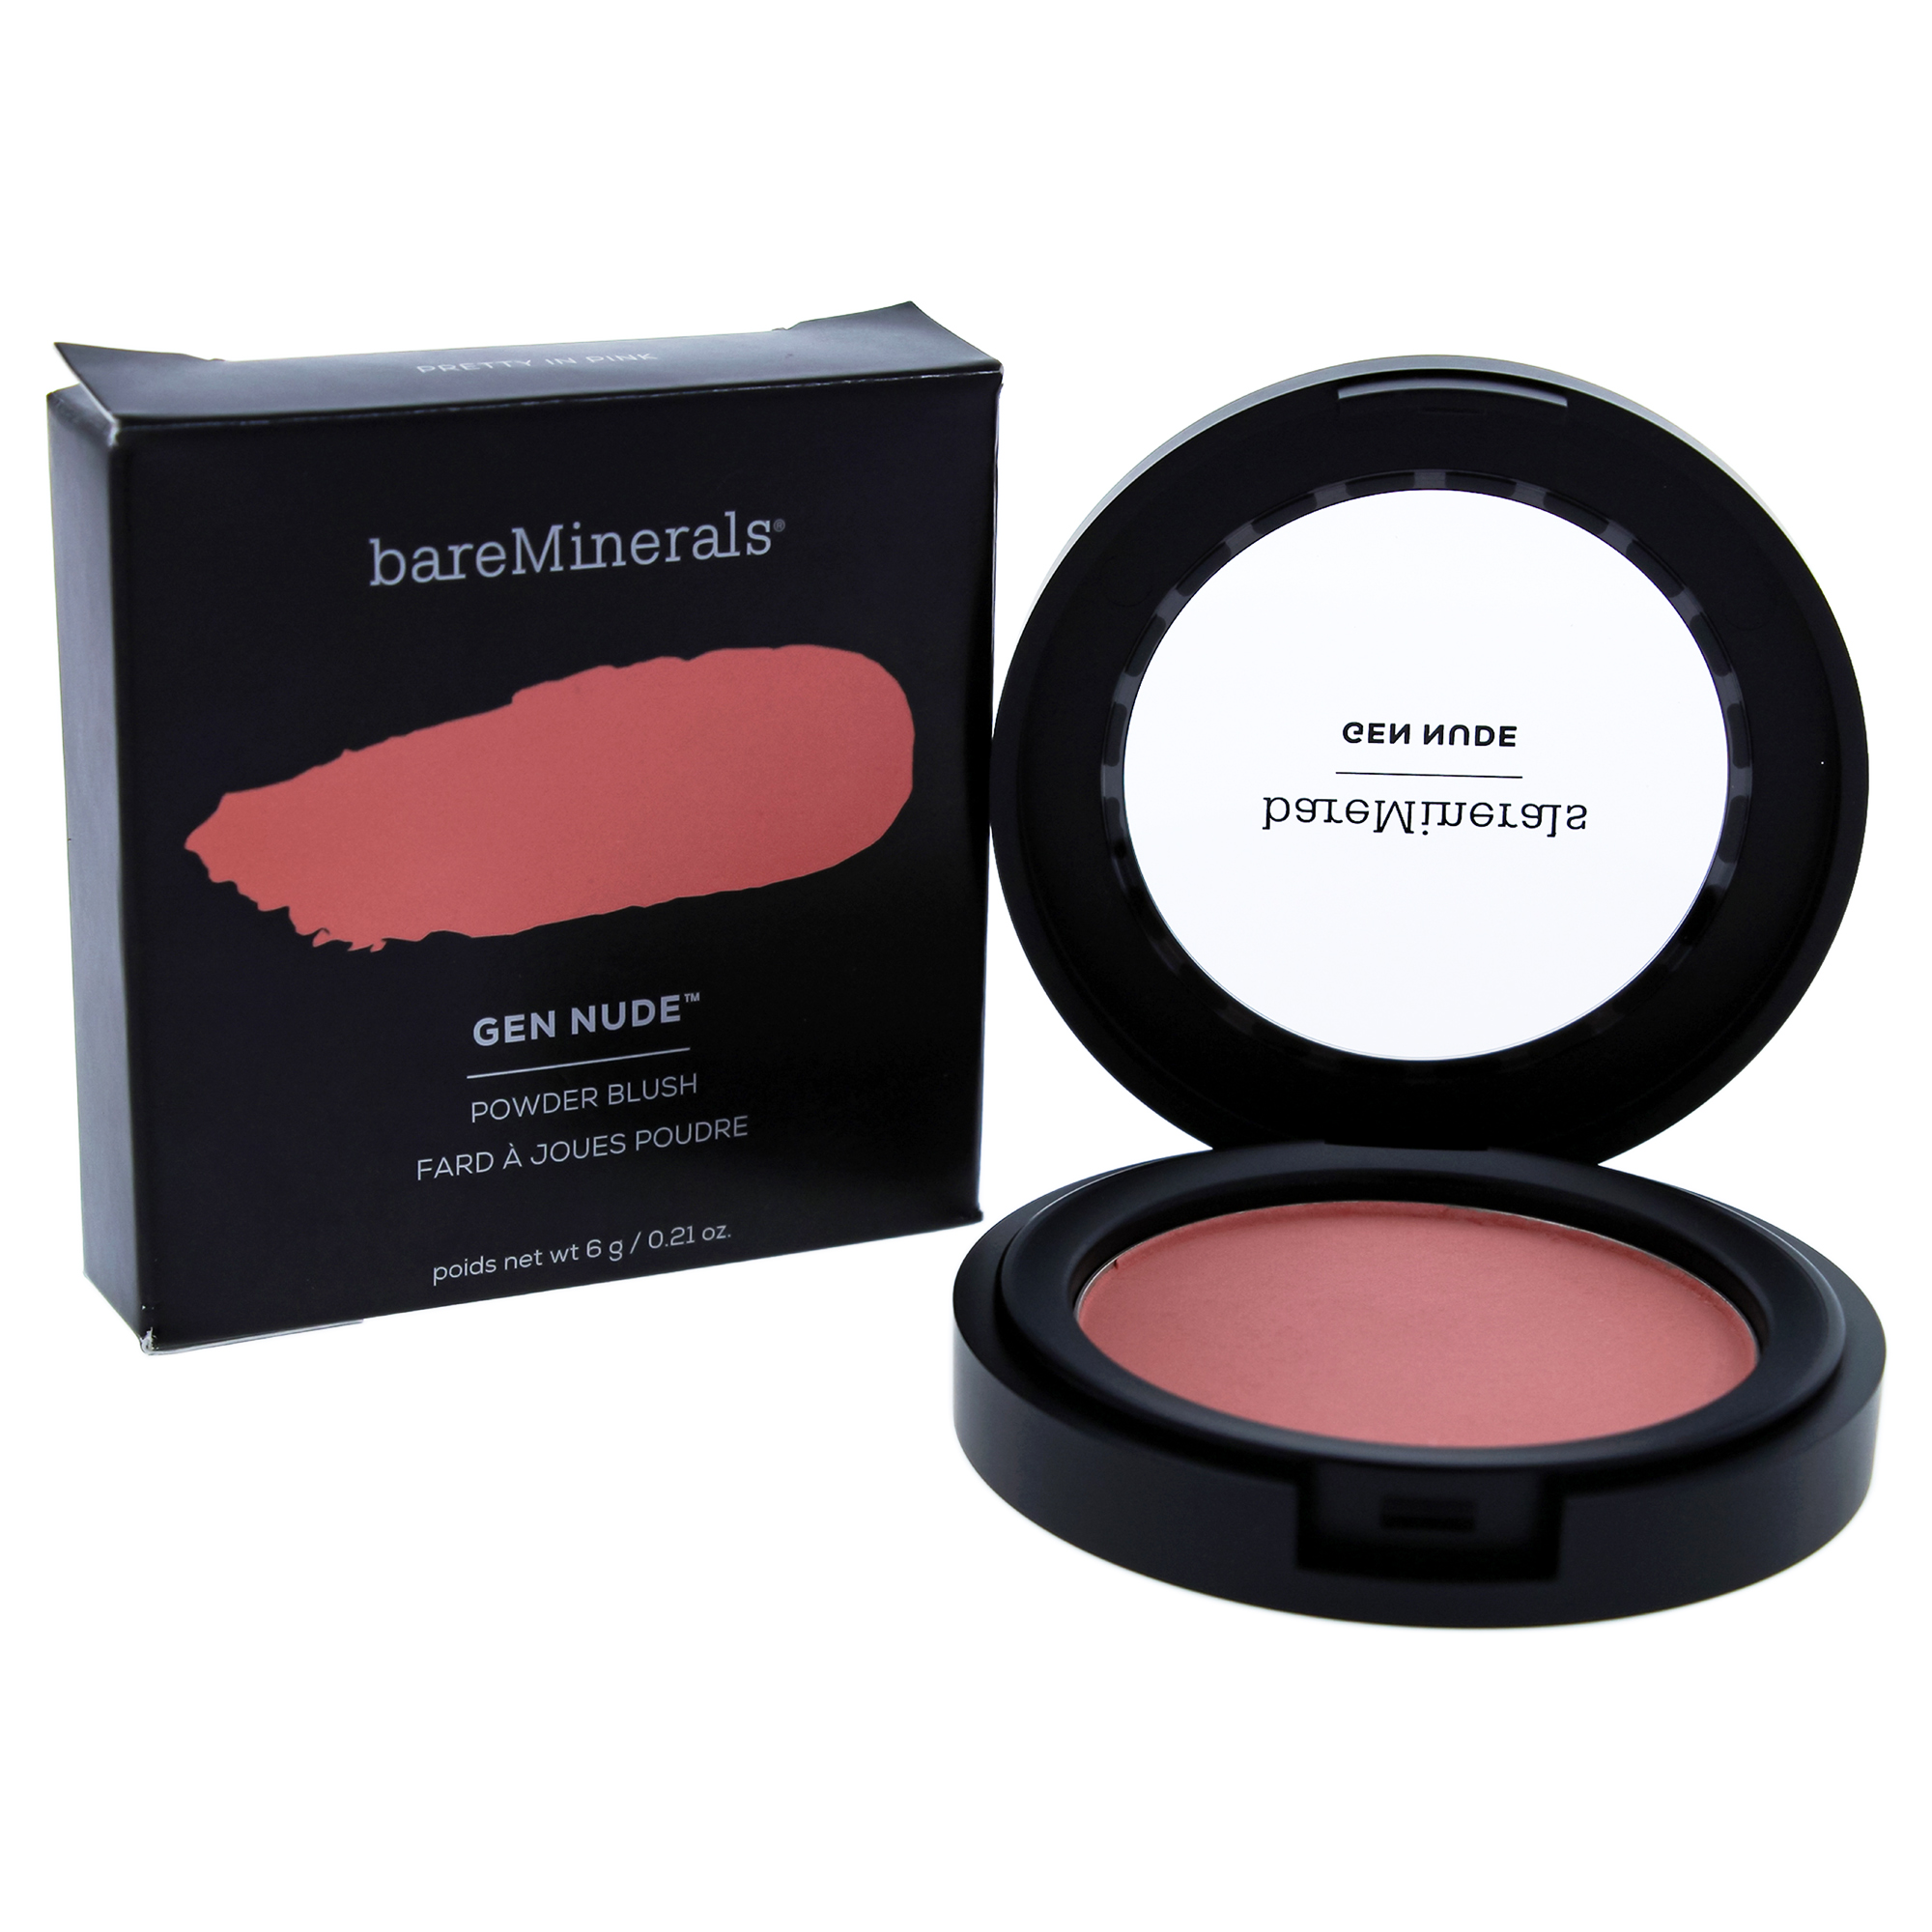 Gen Nude Powder Blush - Pretty In Pink by bareMinerals for Women - 0.21 oz Blush